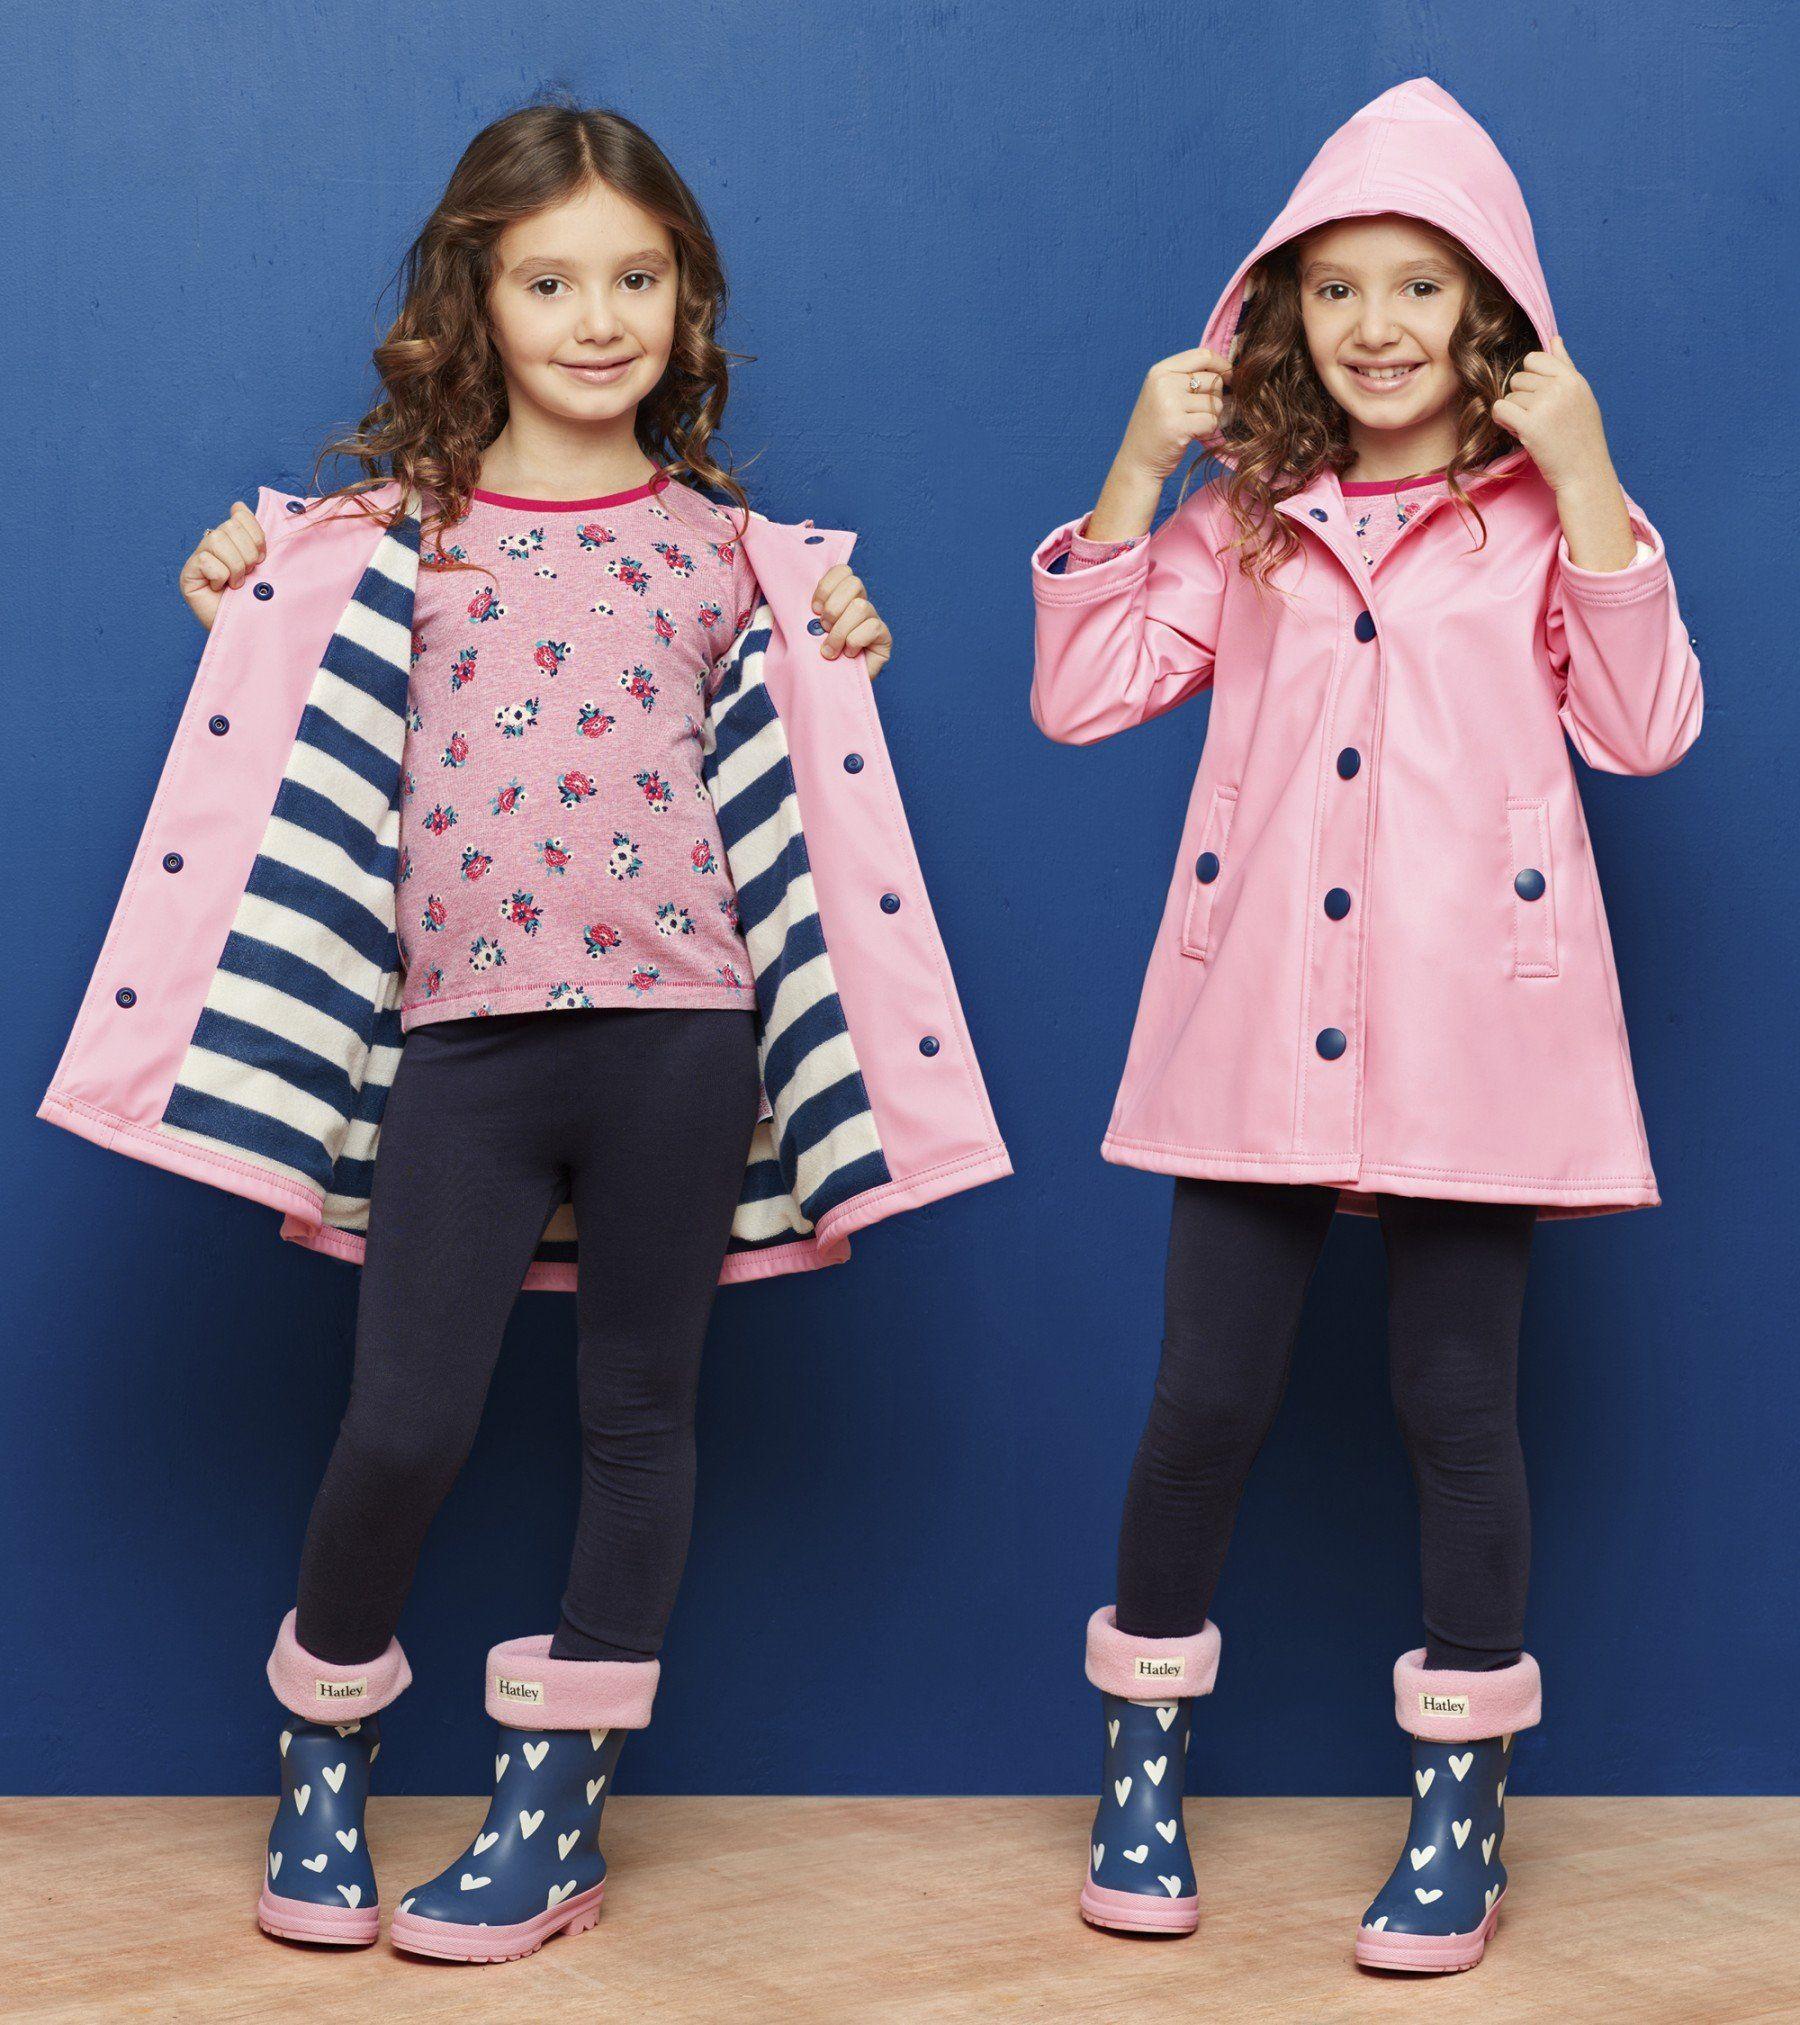 e430495a3b5d Classic Pink   Navy Splash Jacket - Rainwear - Shop All - Girls ...